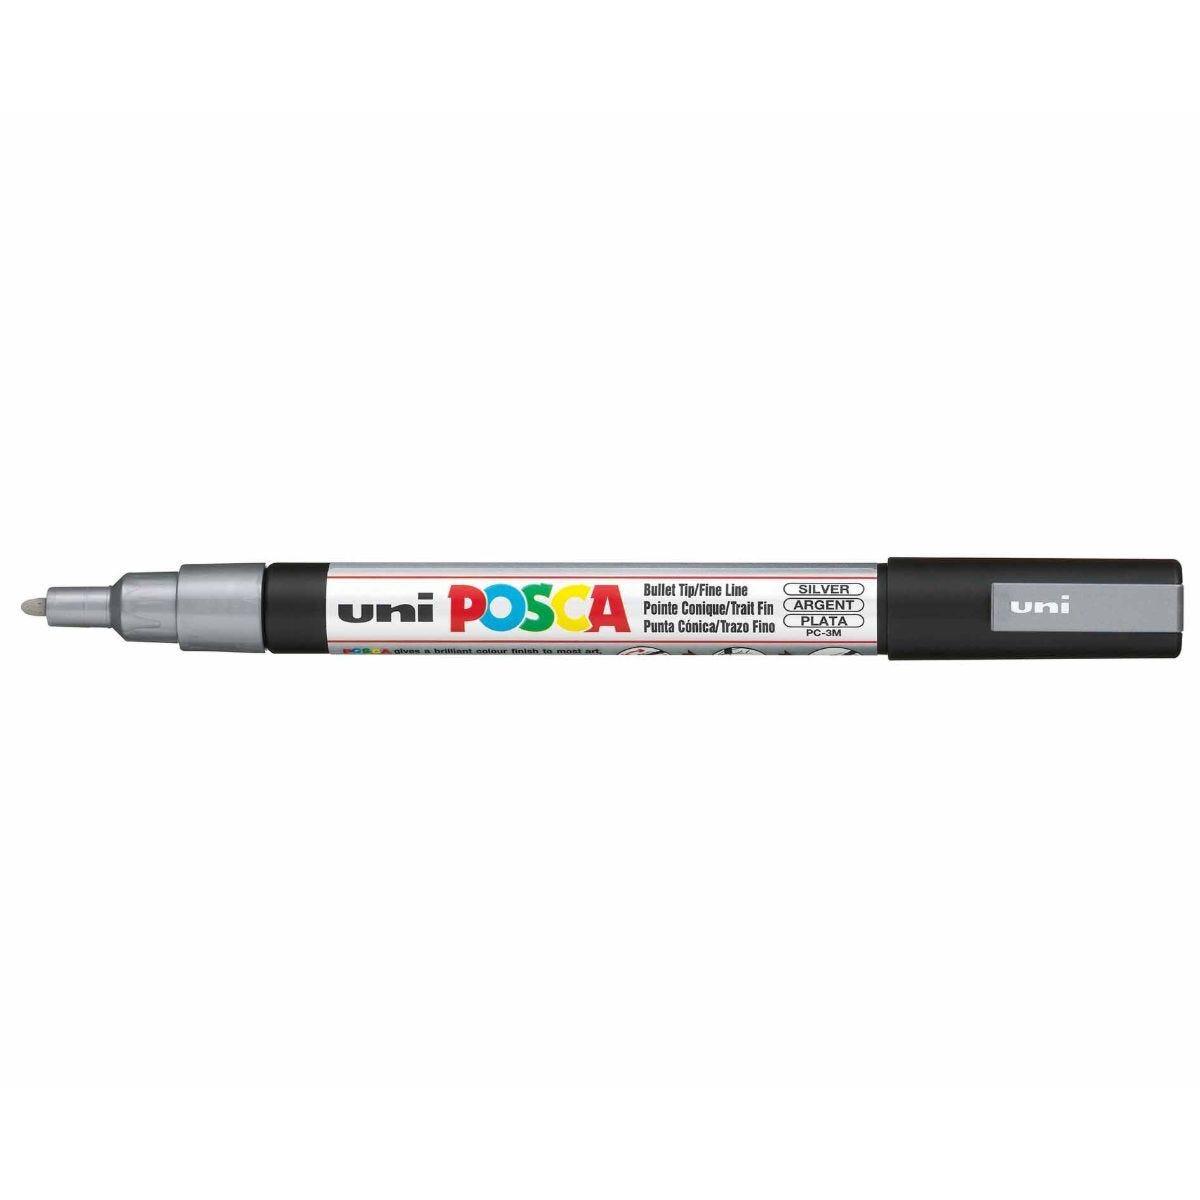 Uni Posca Marker Pen 0.9-1.3mm Bullet Tip PC-3M Silver